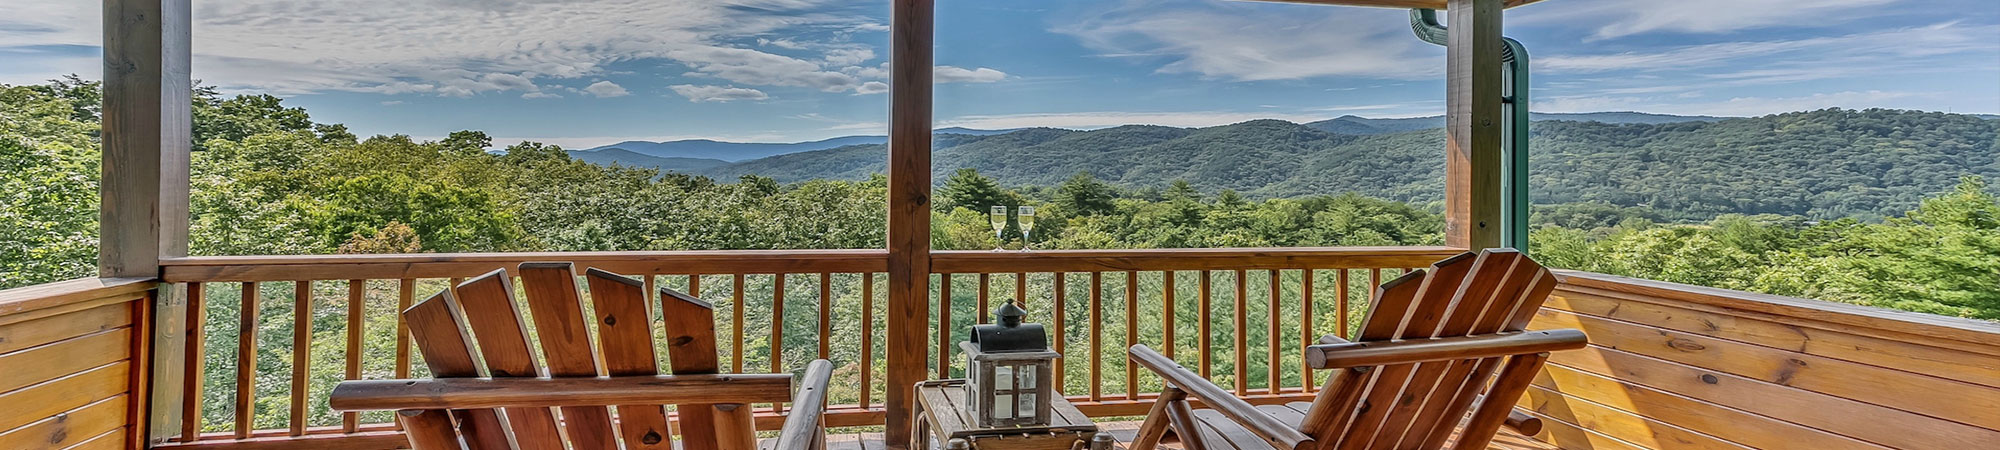 Contact North Georgia Mountain Properties